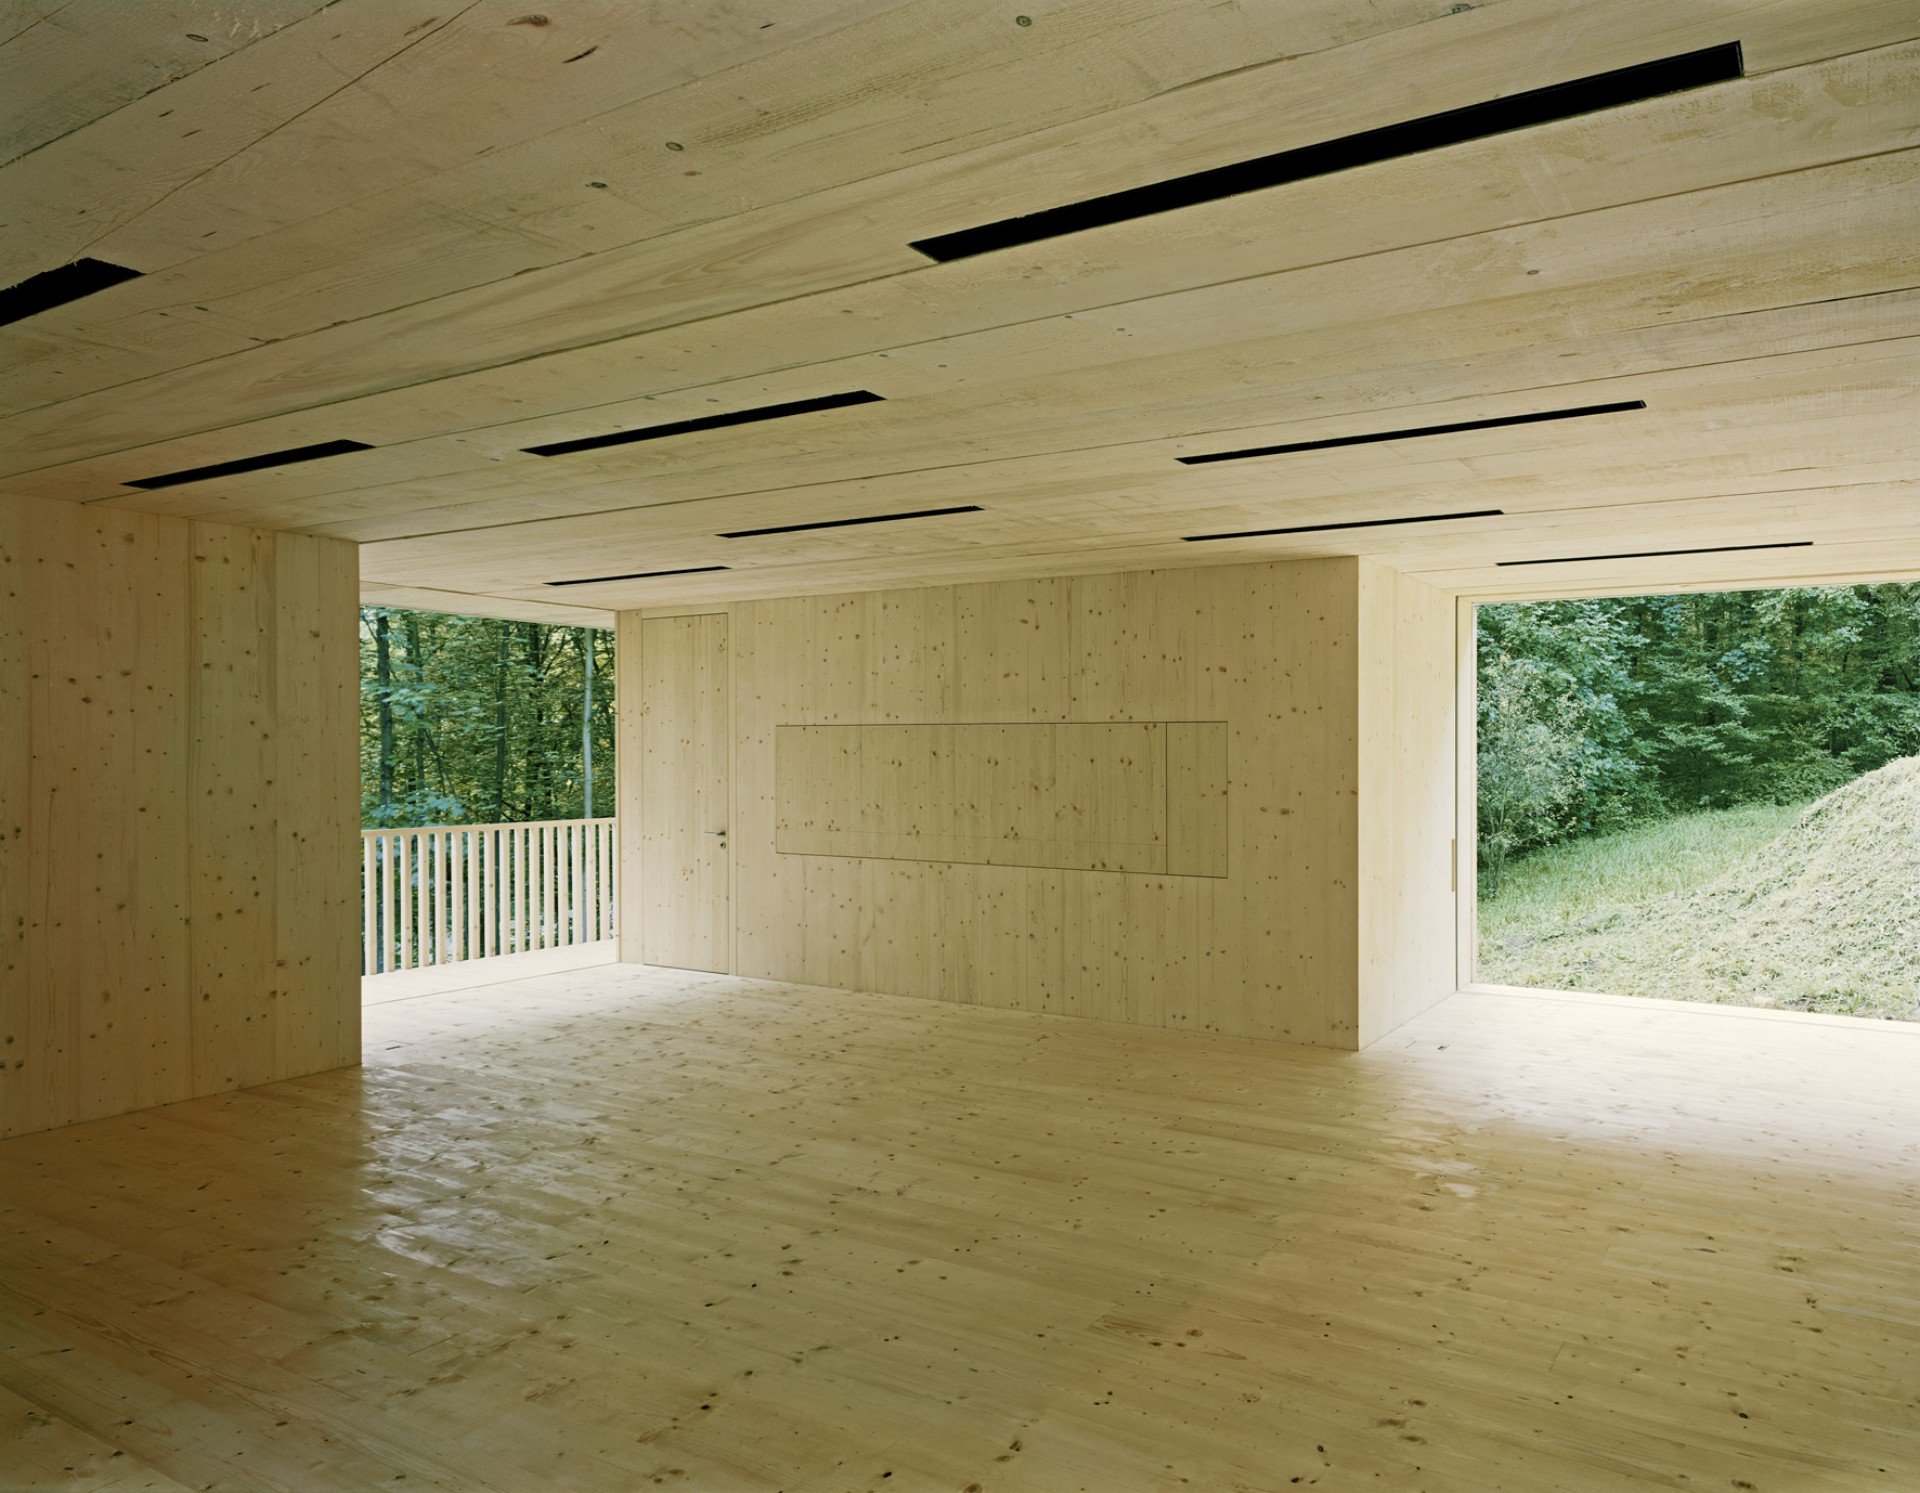 exposition rossetti wyss architekten fingerprints paris floornature. Black Bedroom Furniture Sets. Home Design Ideas